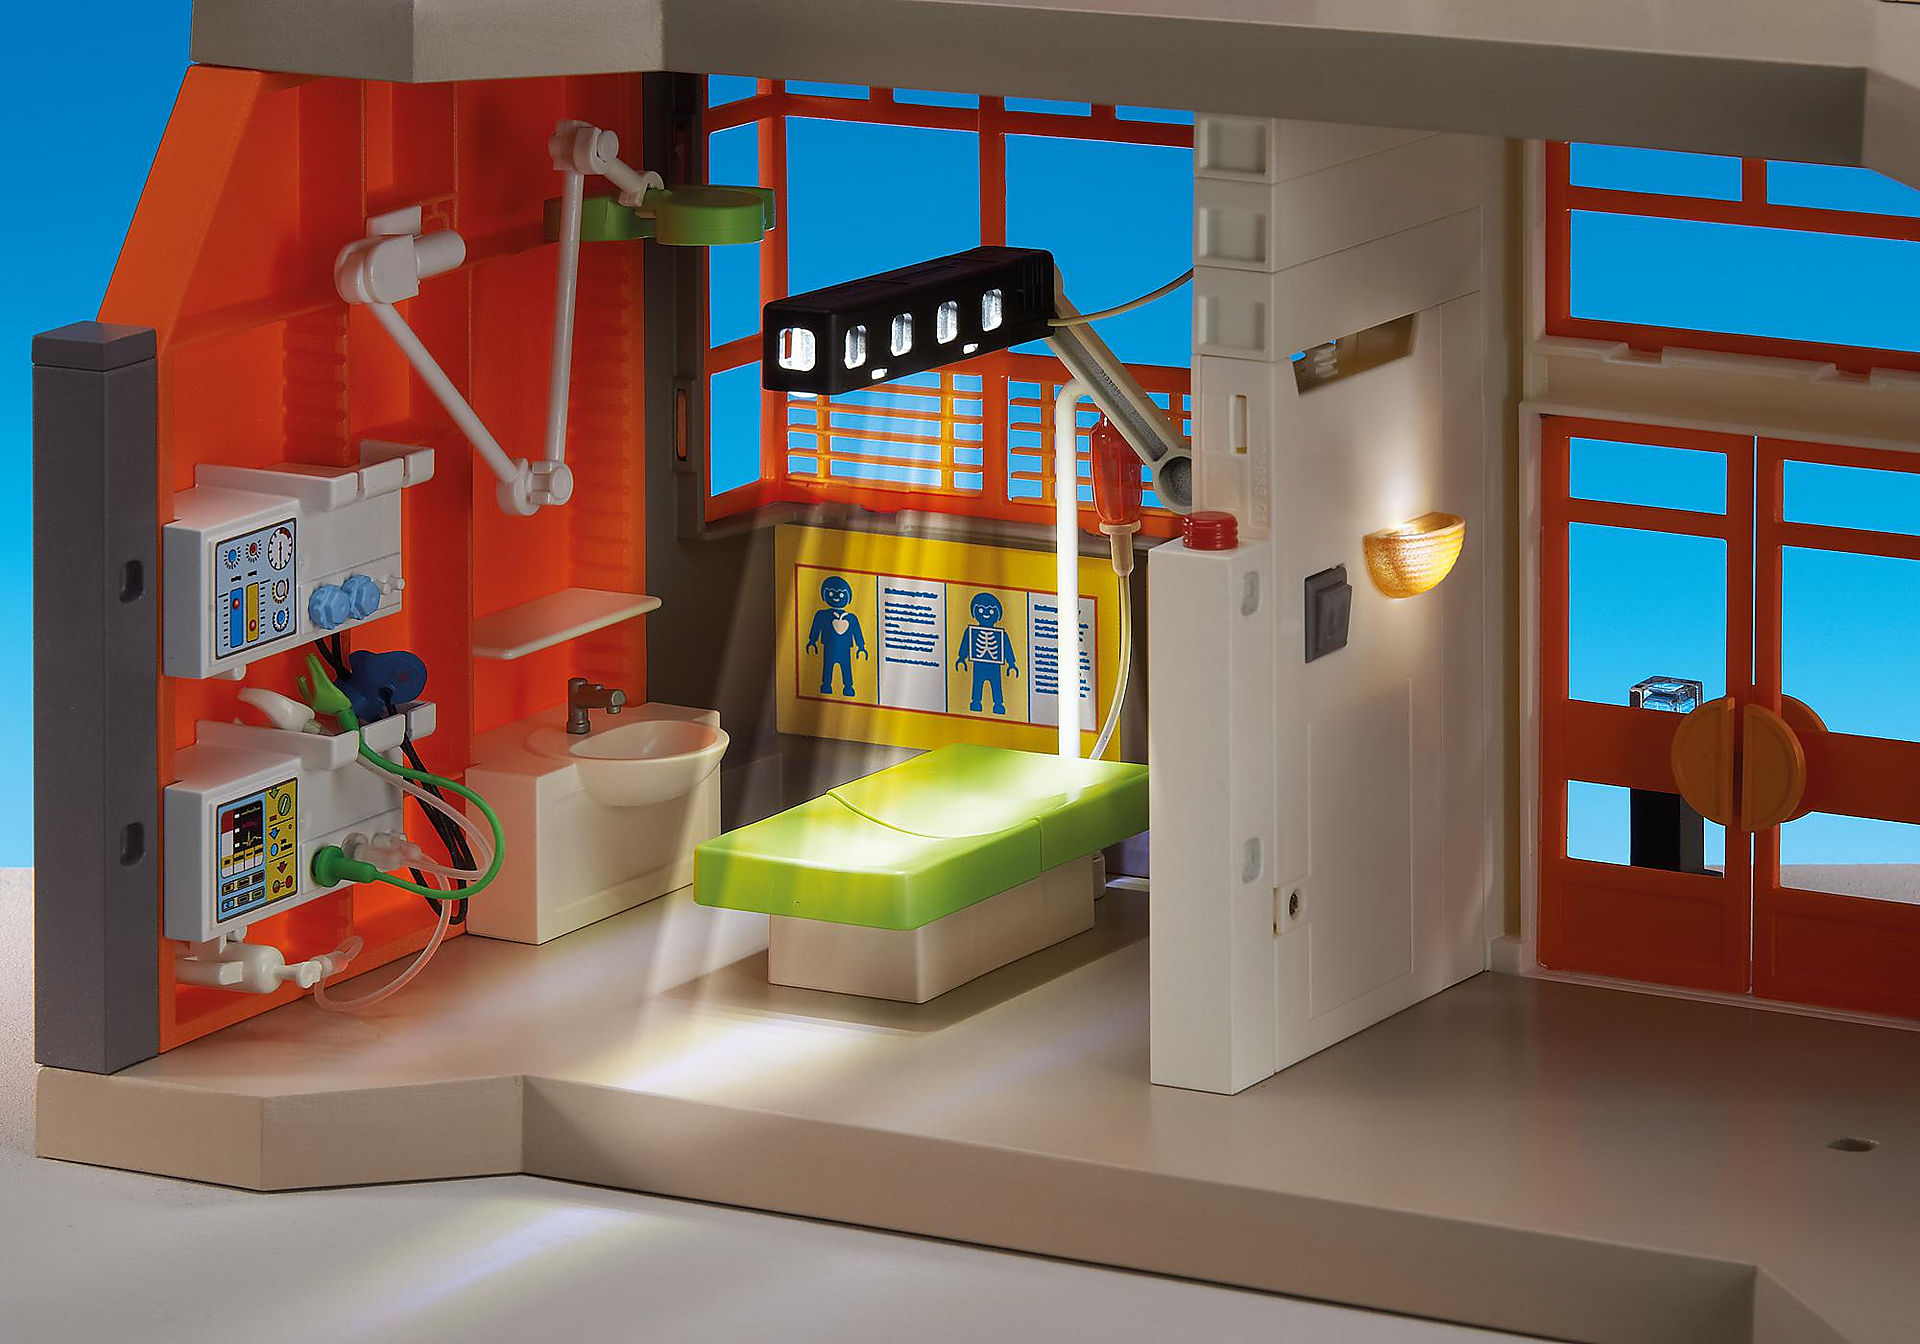 http://media.playmobil.com/i/playmobil/6446_product_extra1/Ηλεκτρικός φωτισμός για τη Μεγάλη Παιδιατρική Κλινική